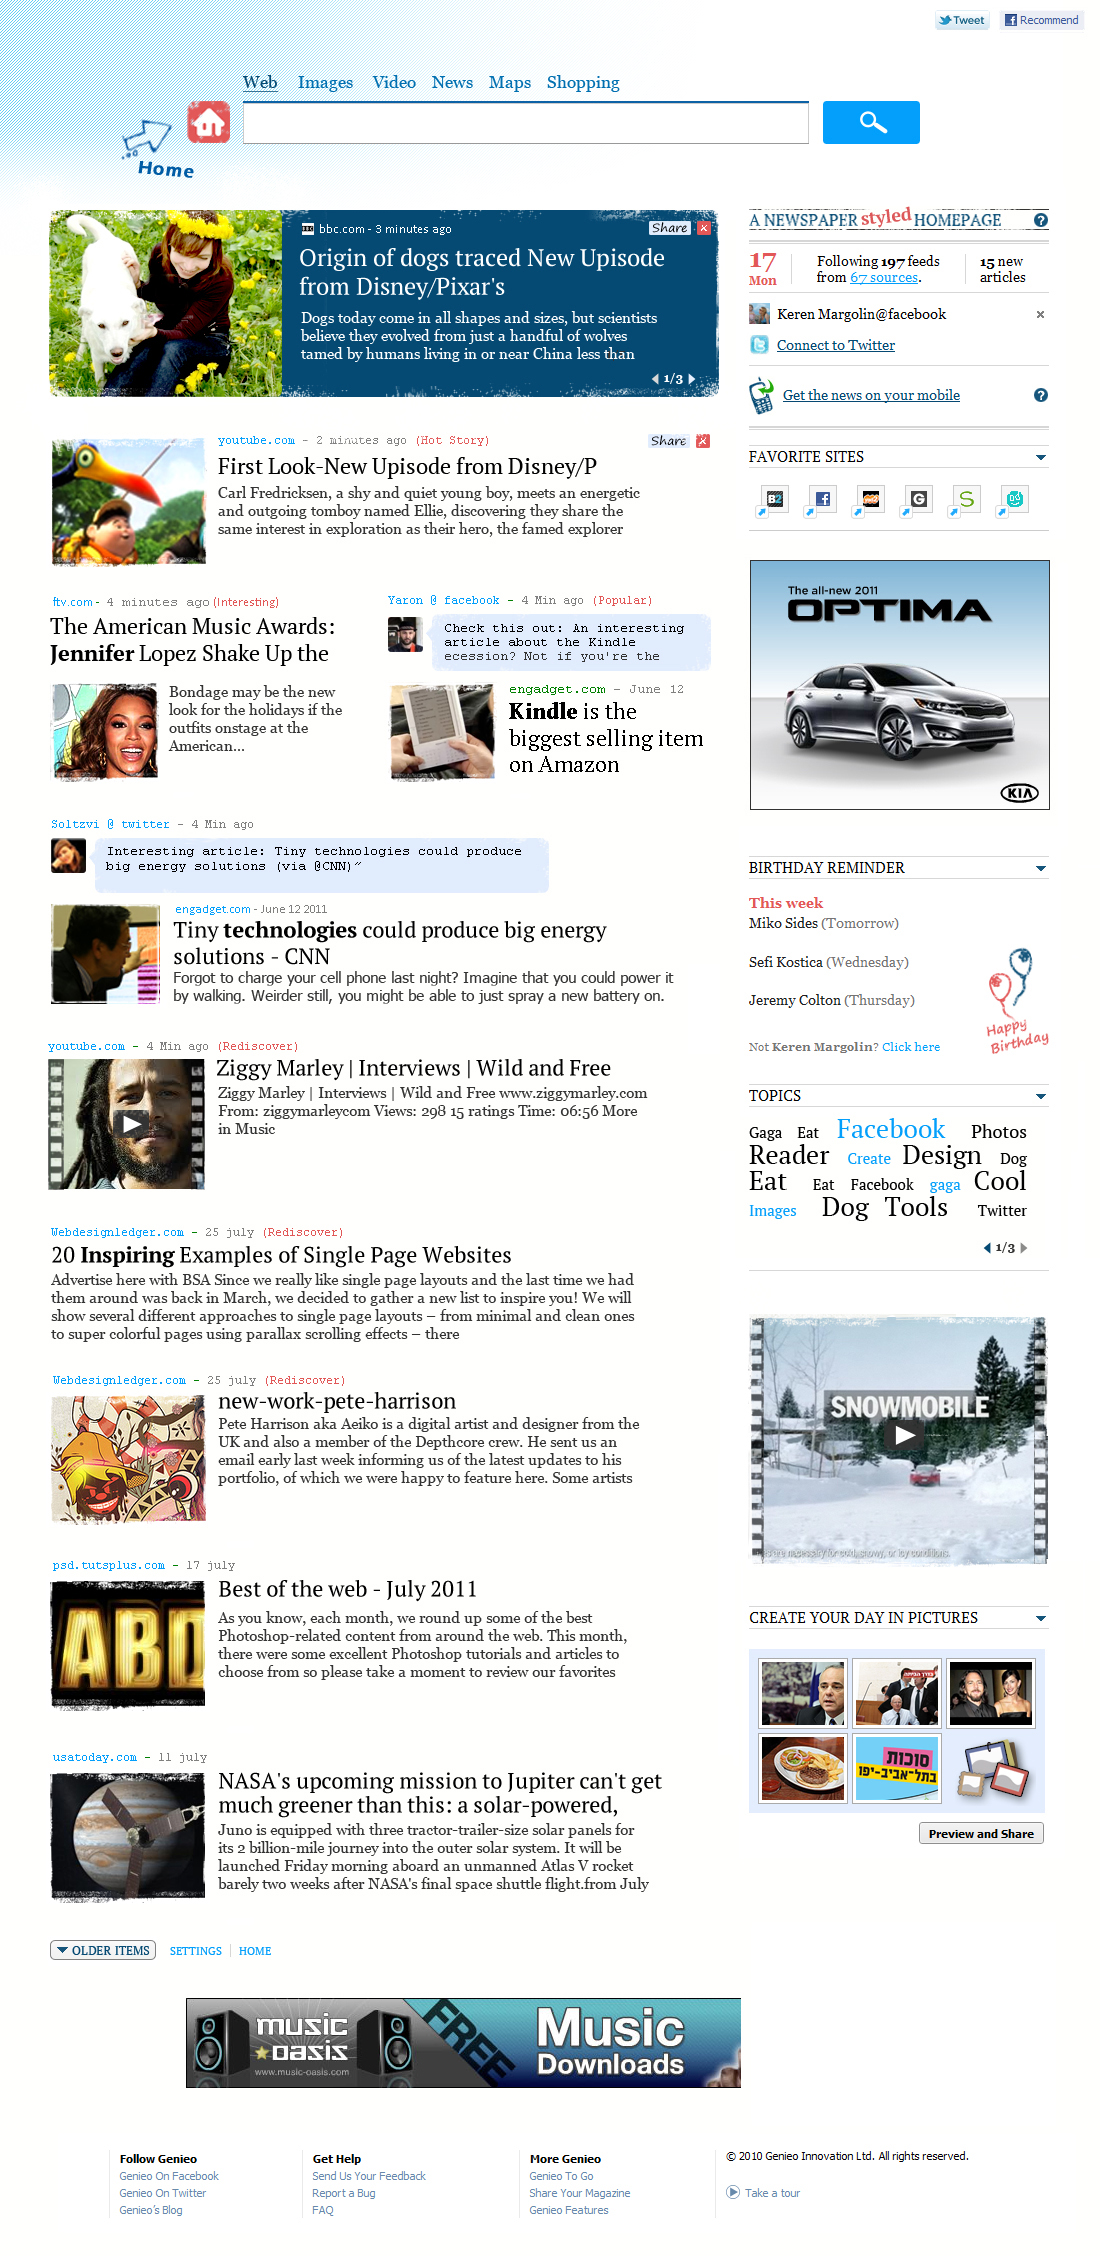 Genieo for Mac screenshot: Genieo, startpage, start page, rss feed, breaking news, Macintosh, Mac, newspaper, news feed, homepage,igoogle